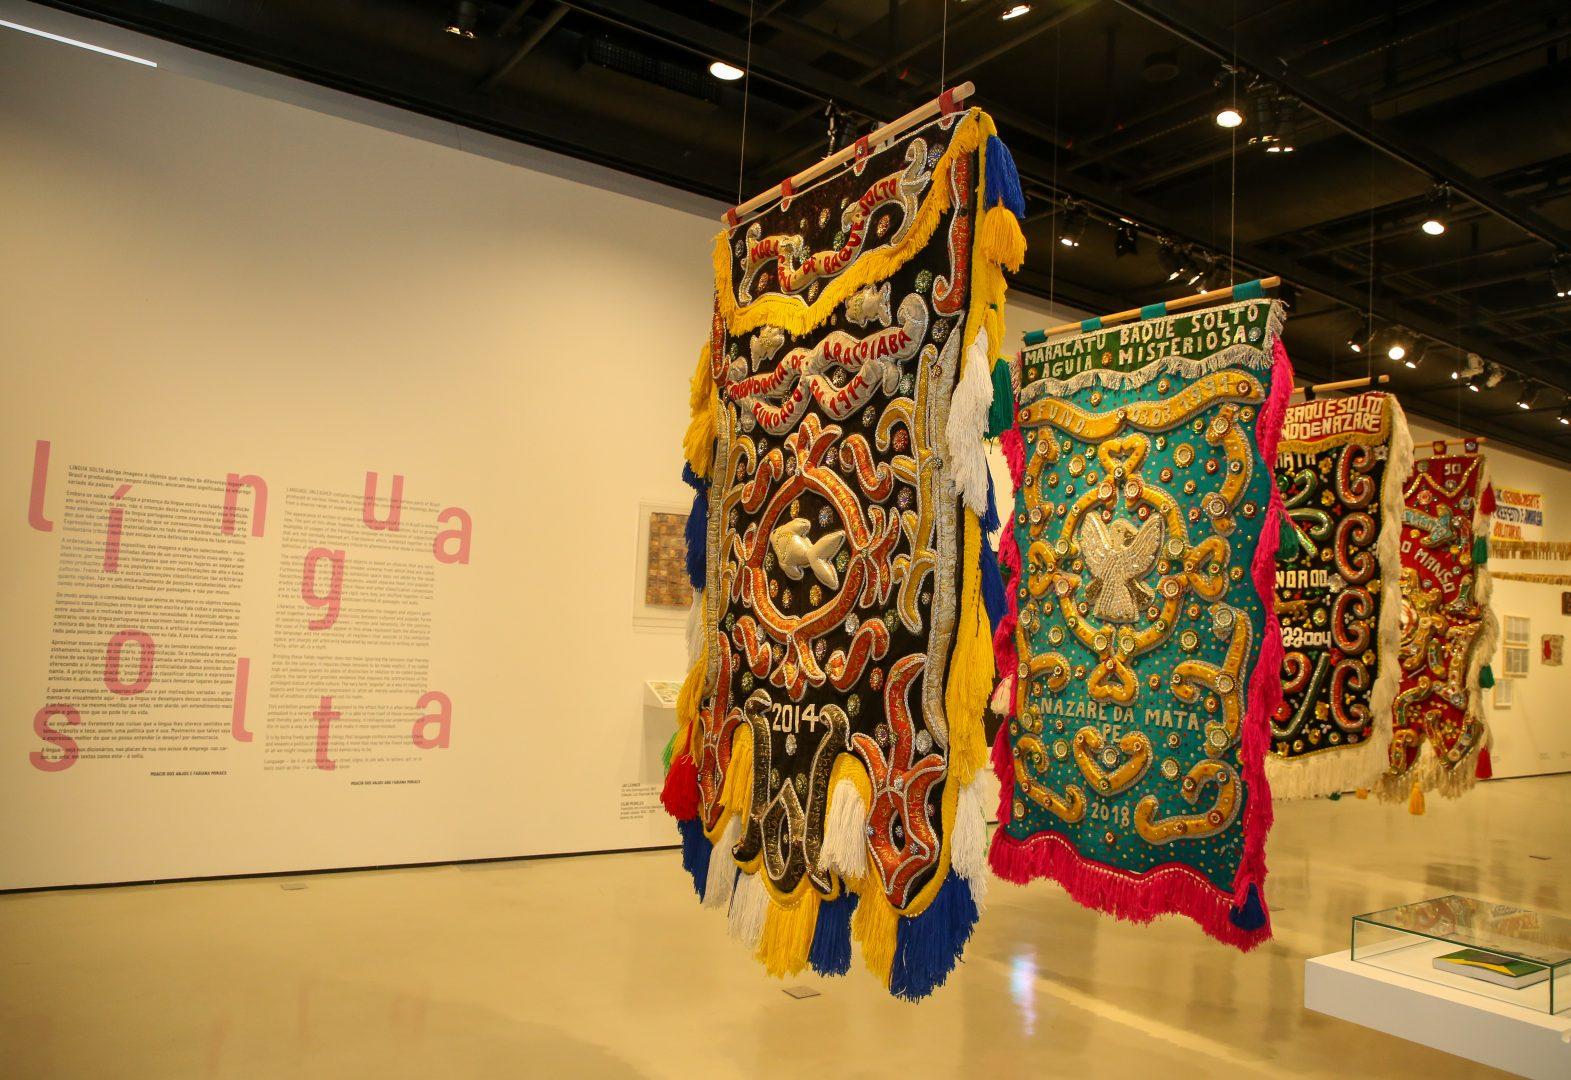 Exposição 'Língua Solta' no Museu da Língua Portuguesa